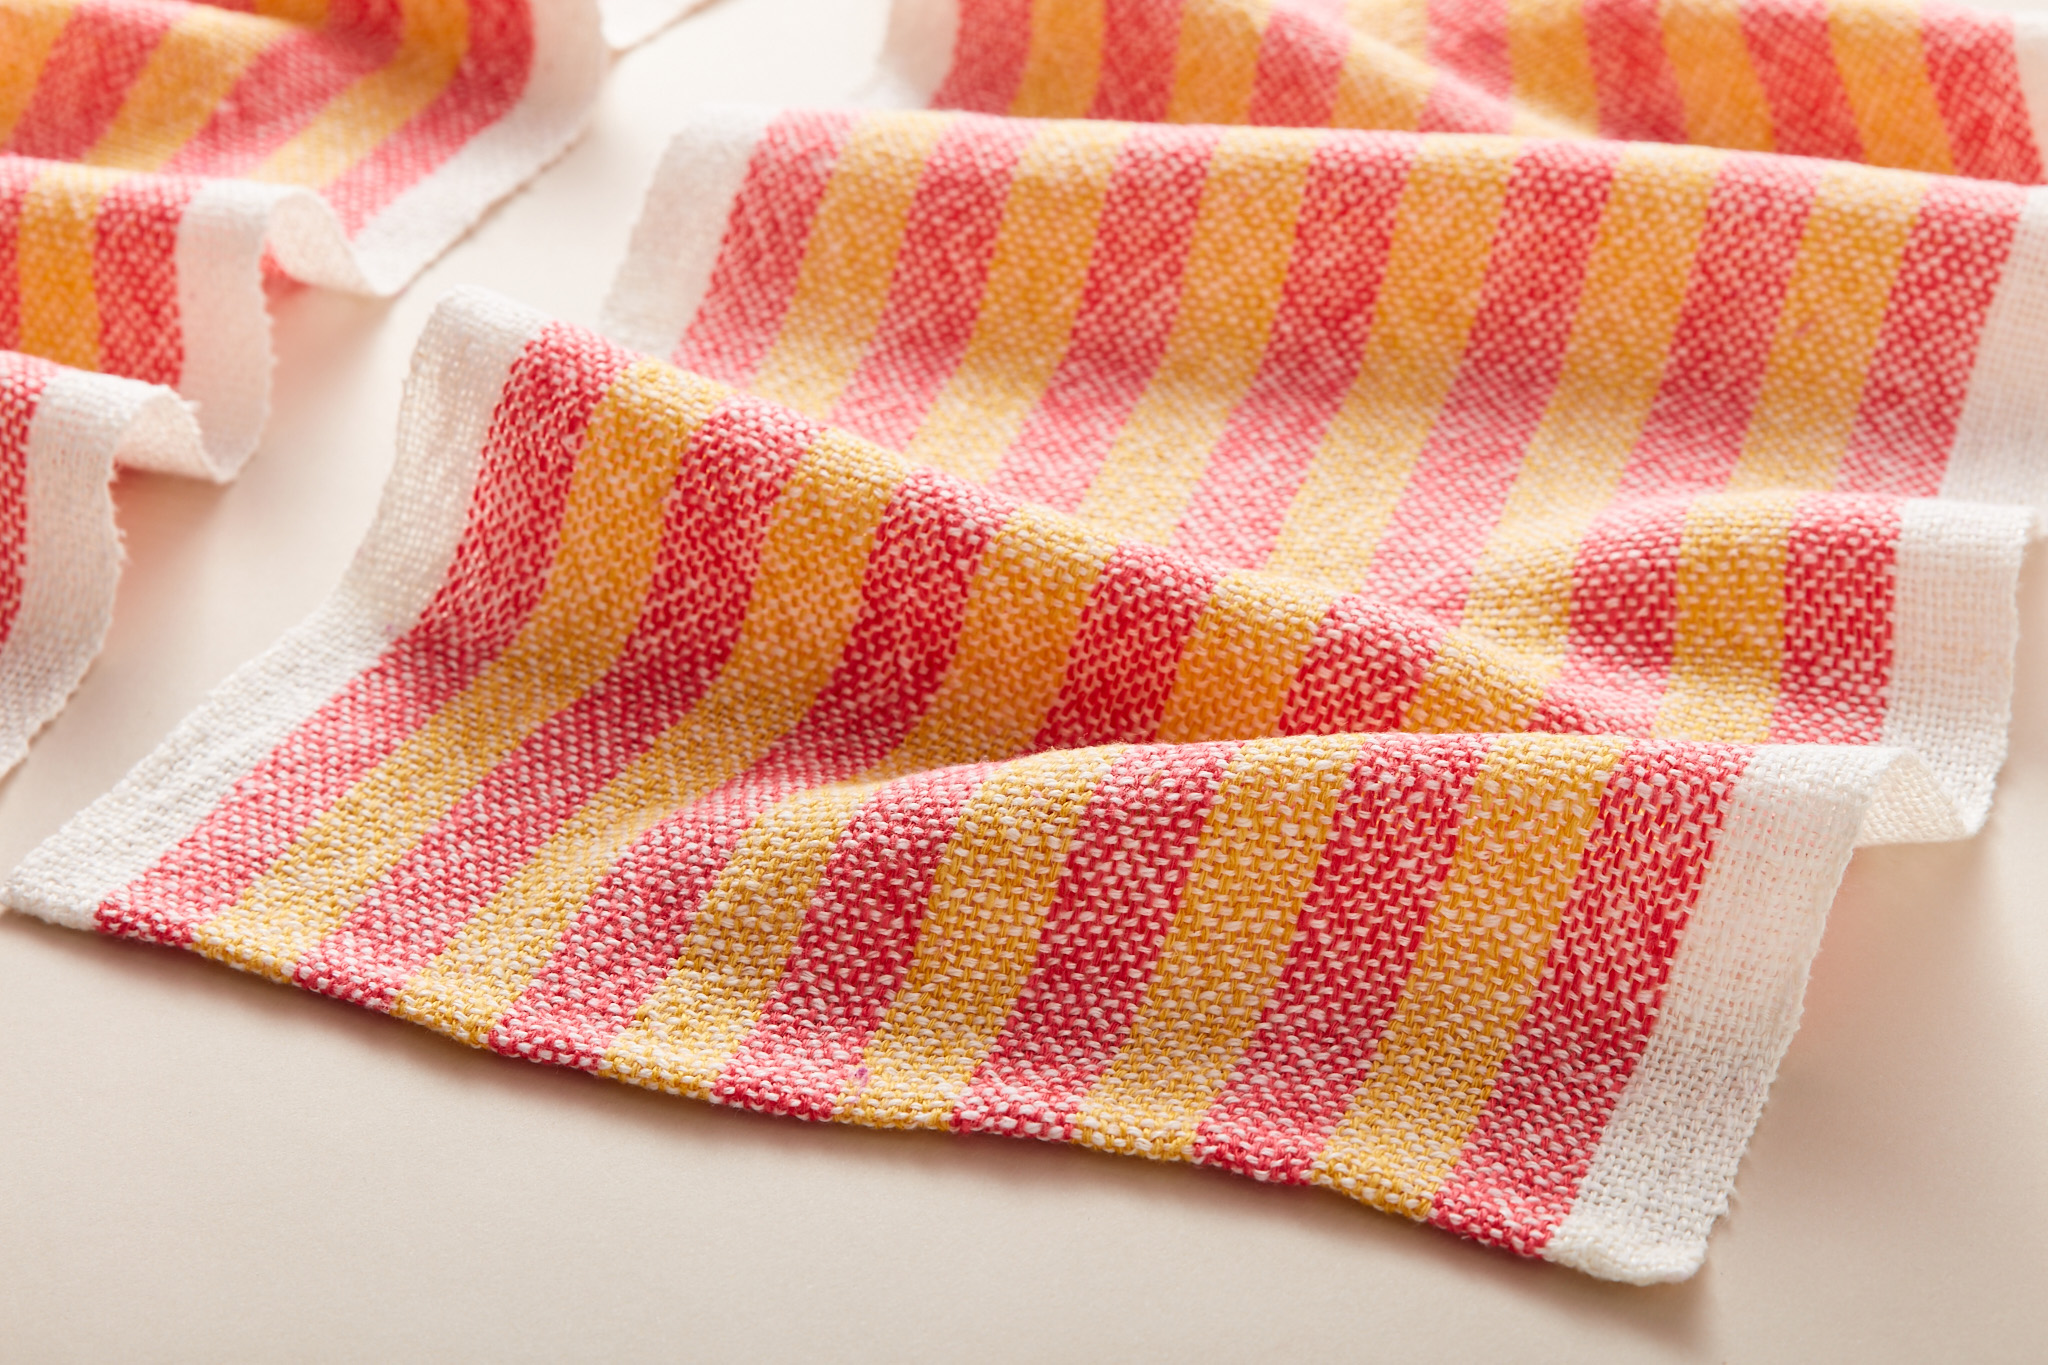 Tabby Weave Handwoven Towels